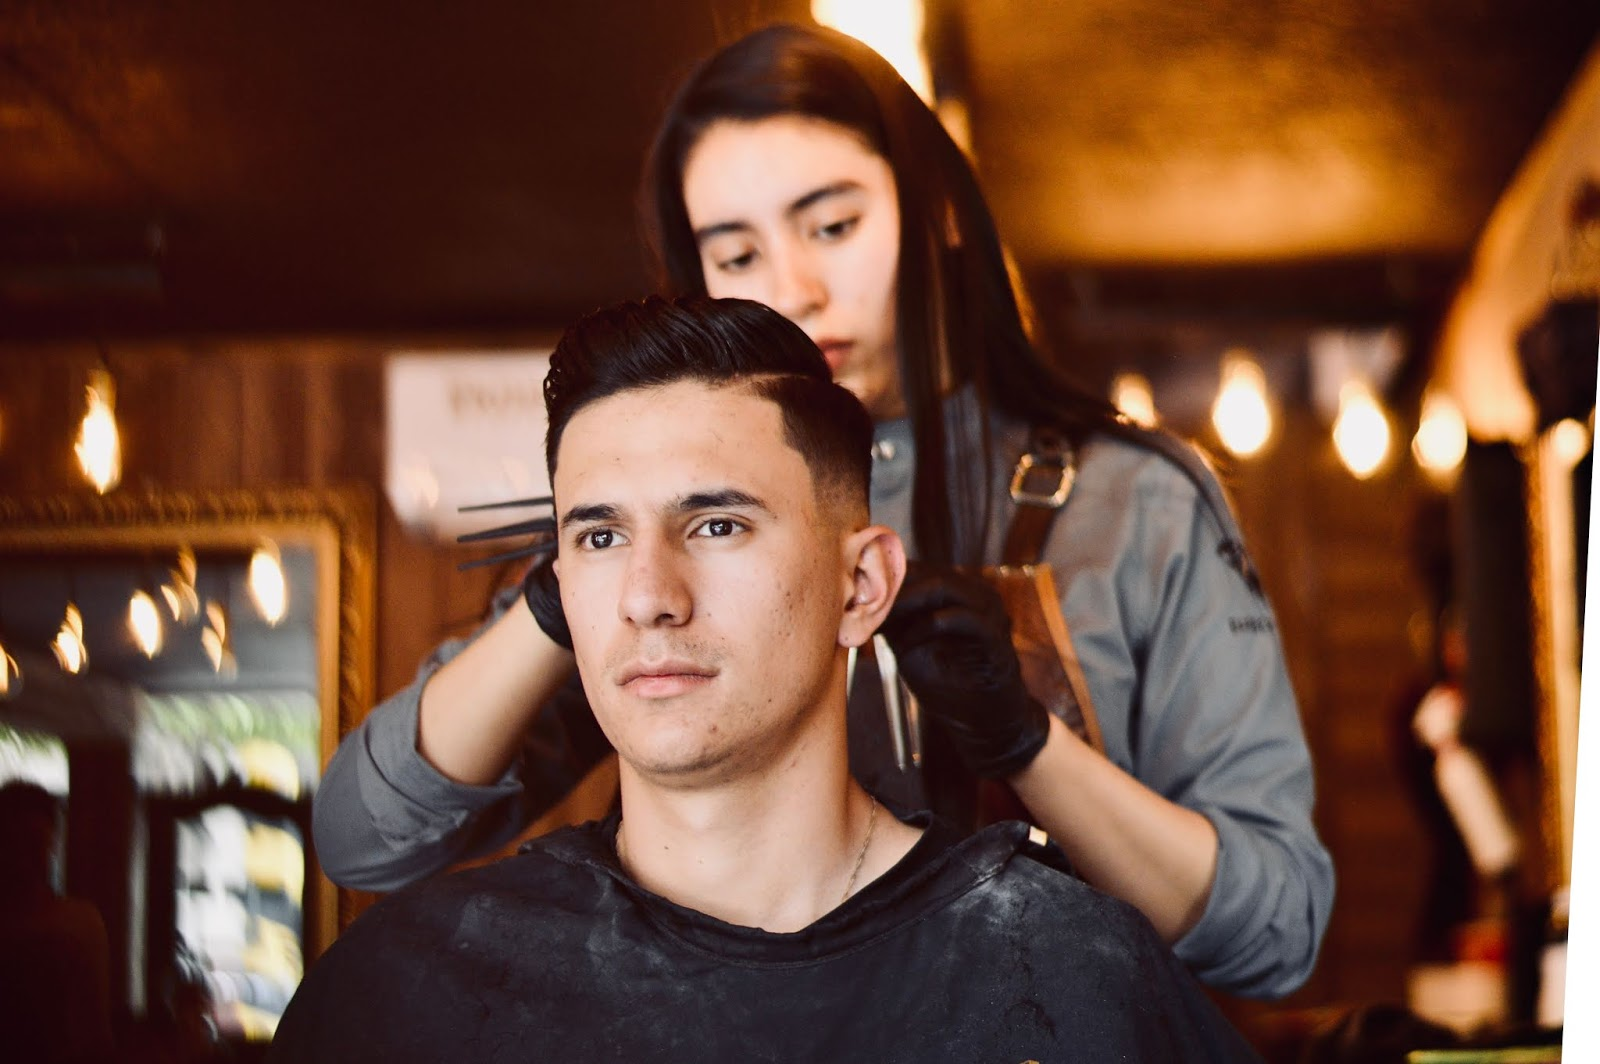 Barber Life Pompadour Krótka Lekcja Historii